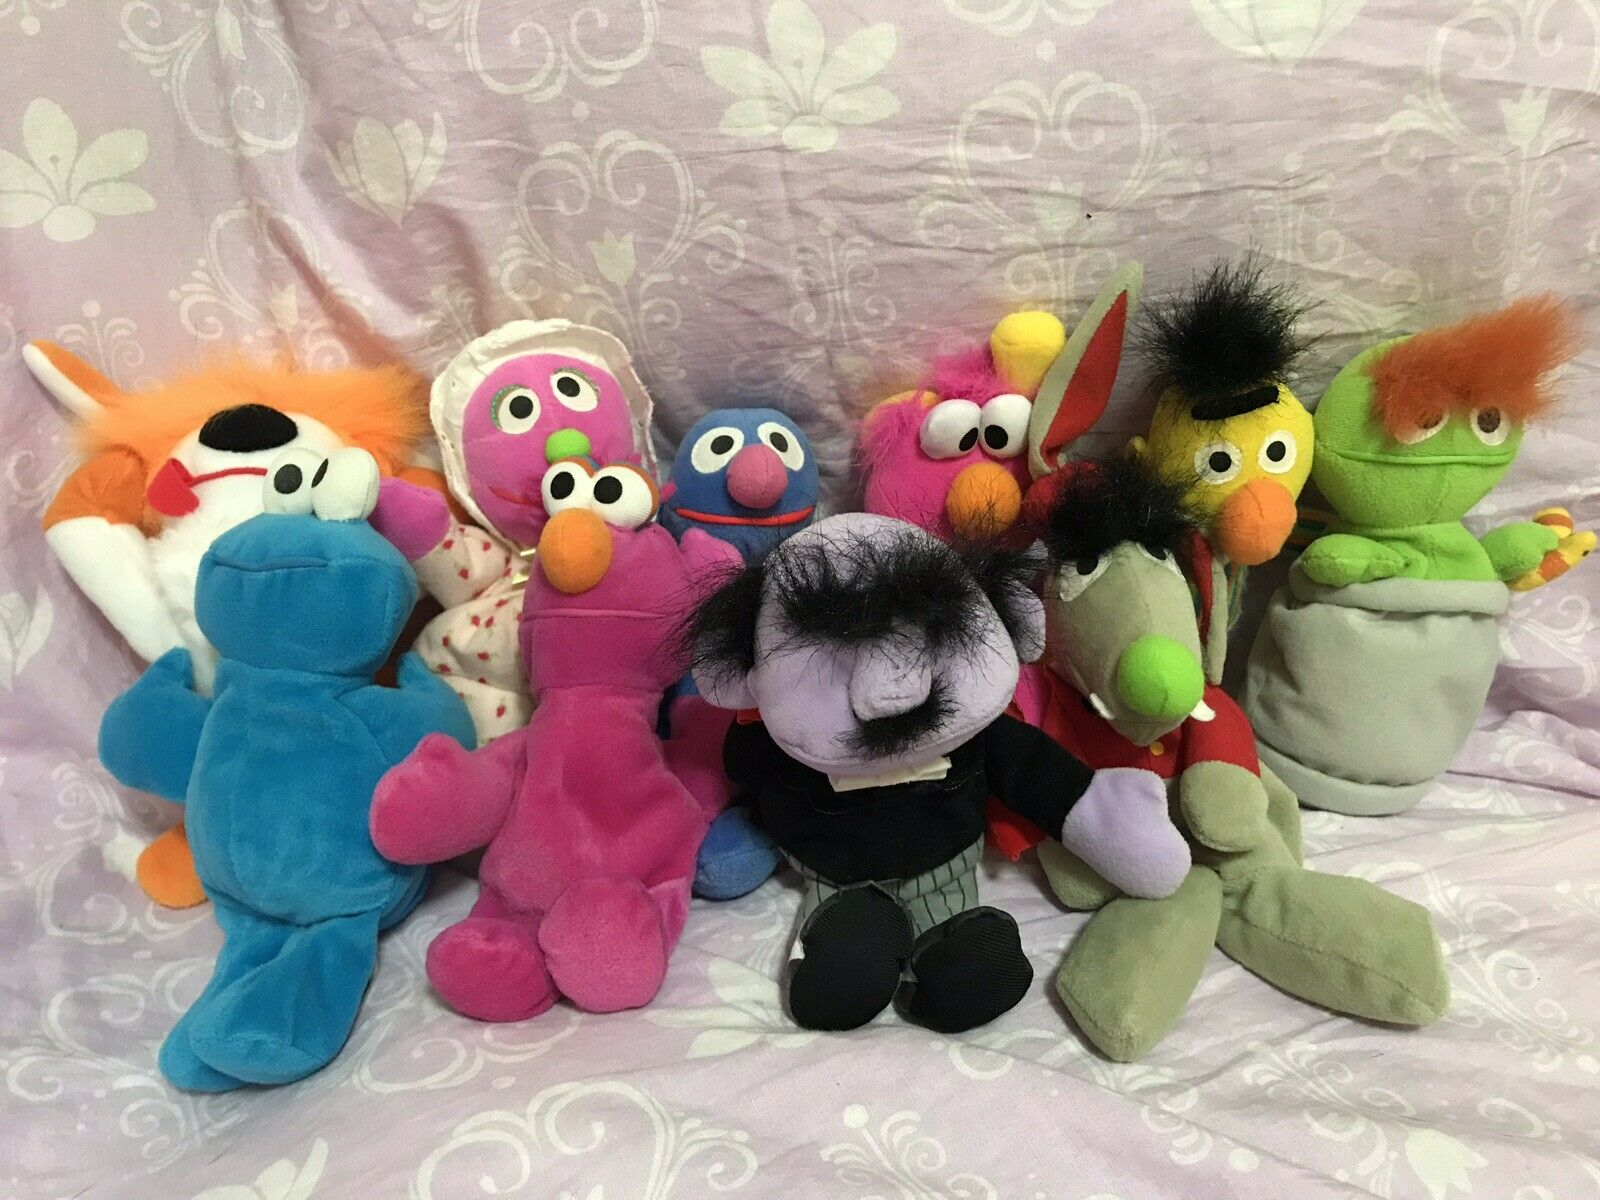 Lot of Sesame Street Plush Doll Bean Toys